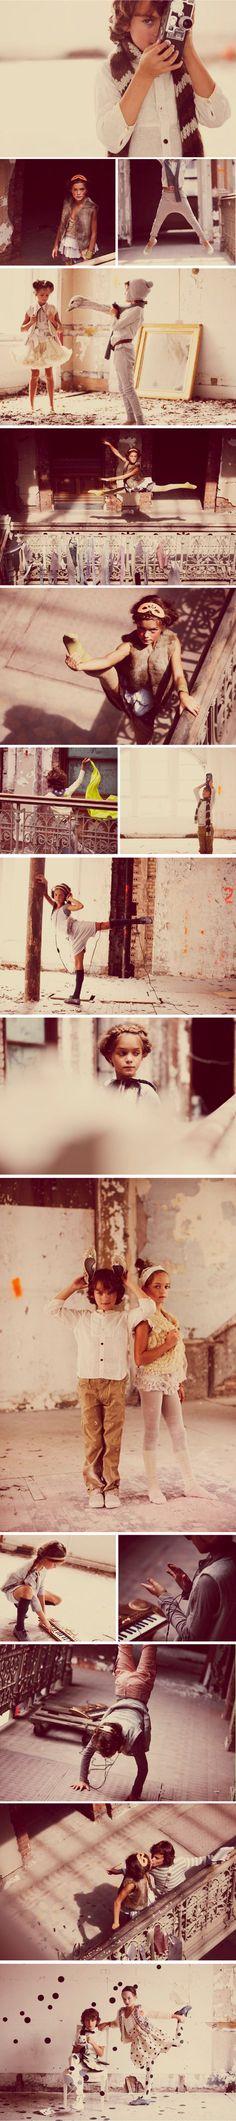 Awesome Photoshoot!    (Children's Editorial Fashion Shoot – La Petite Peach)